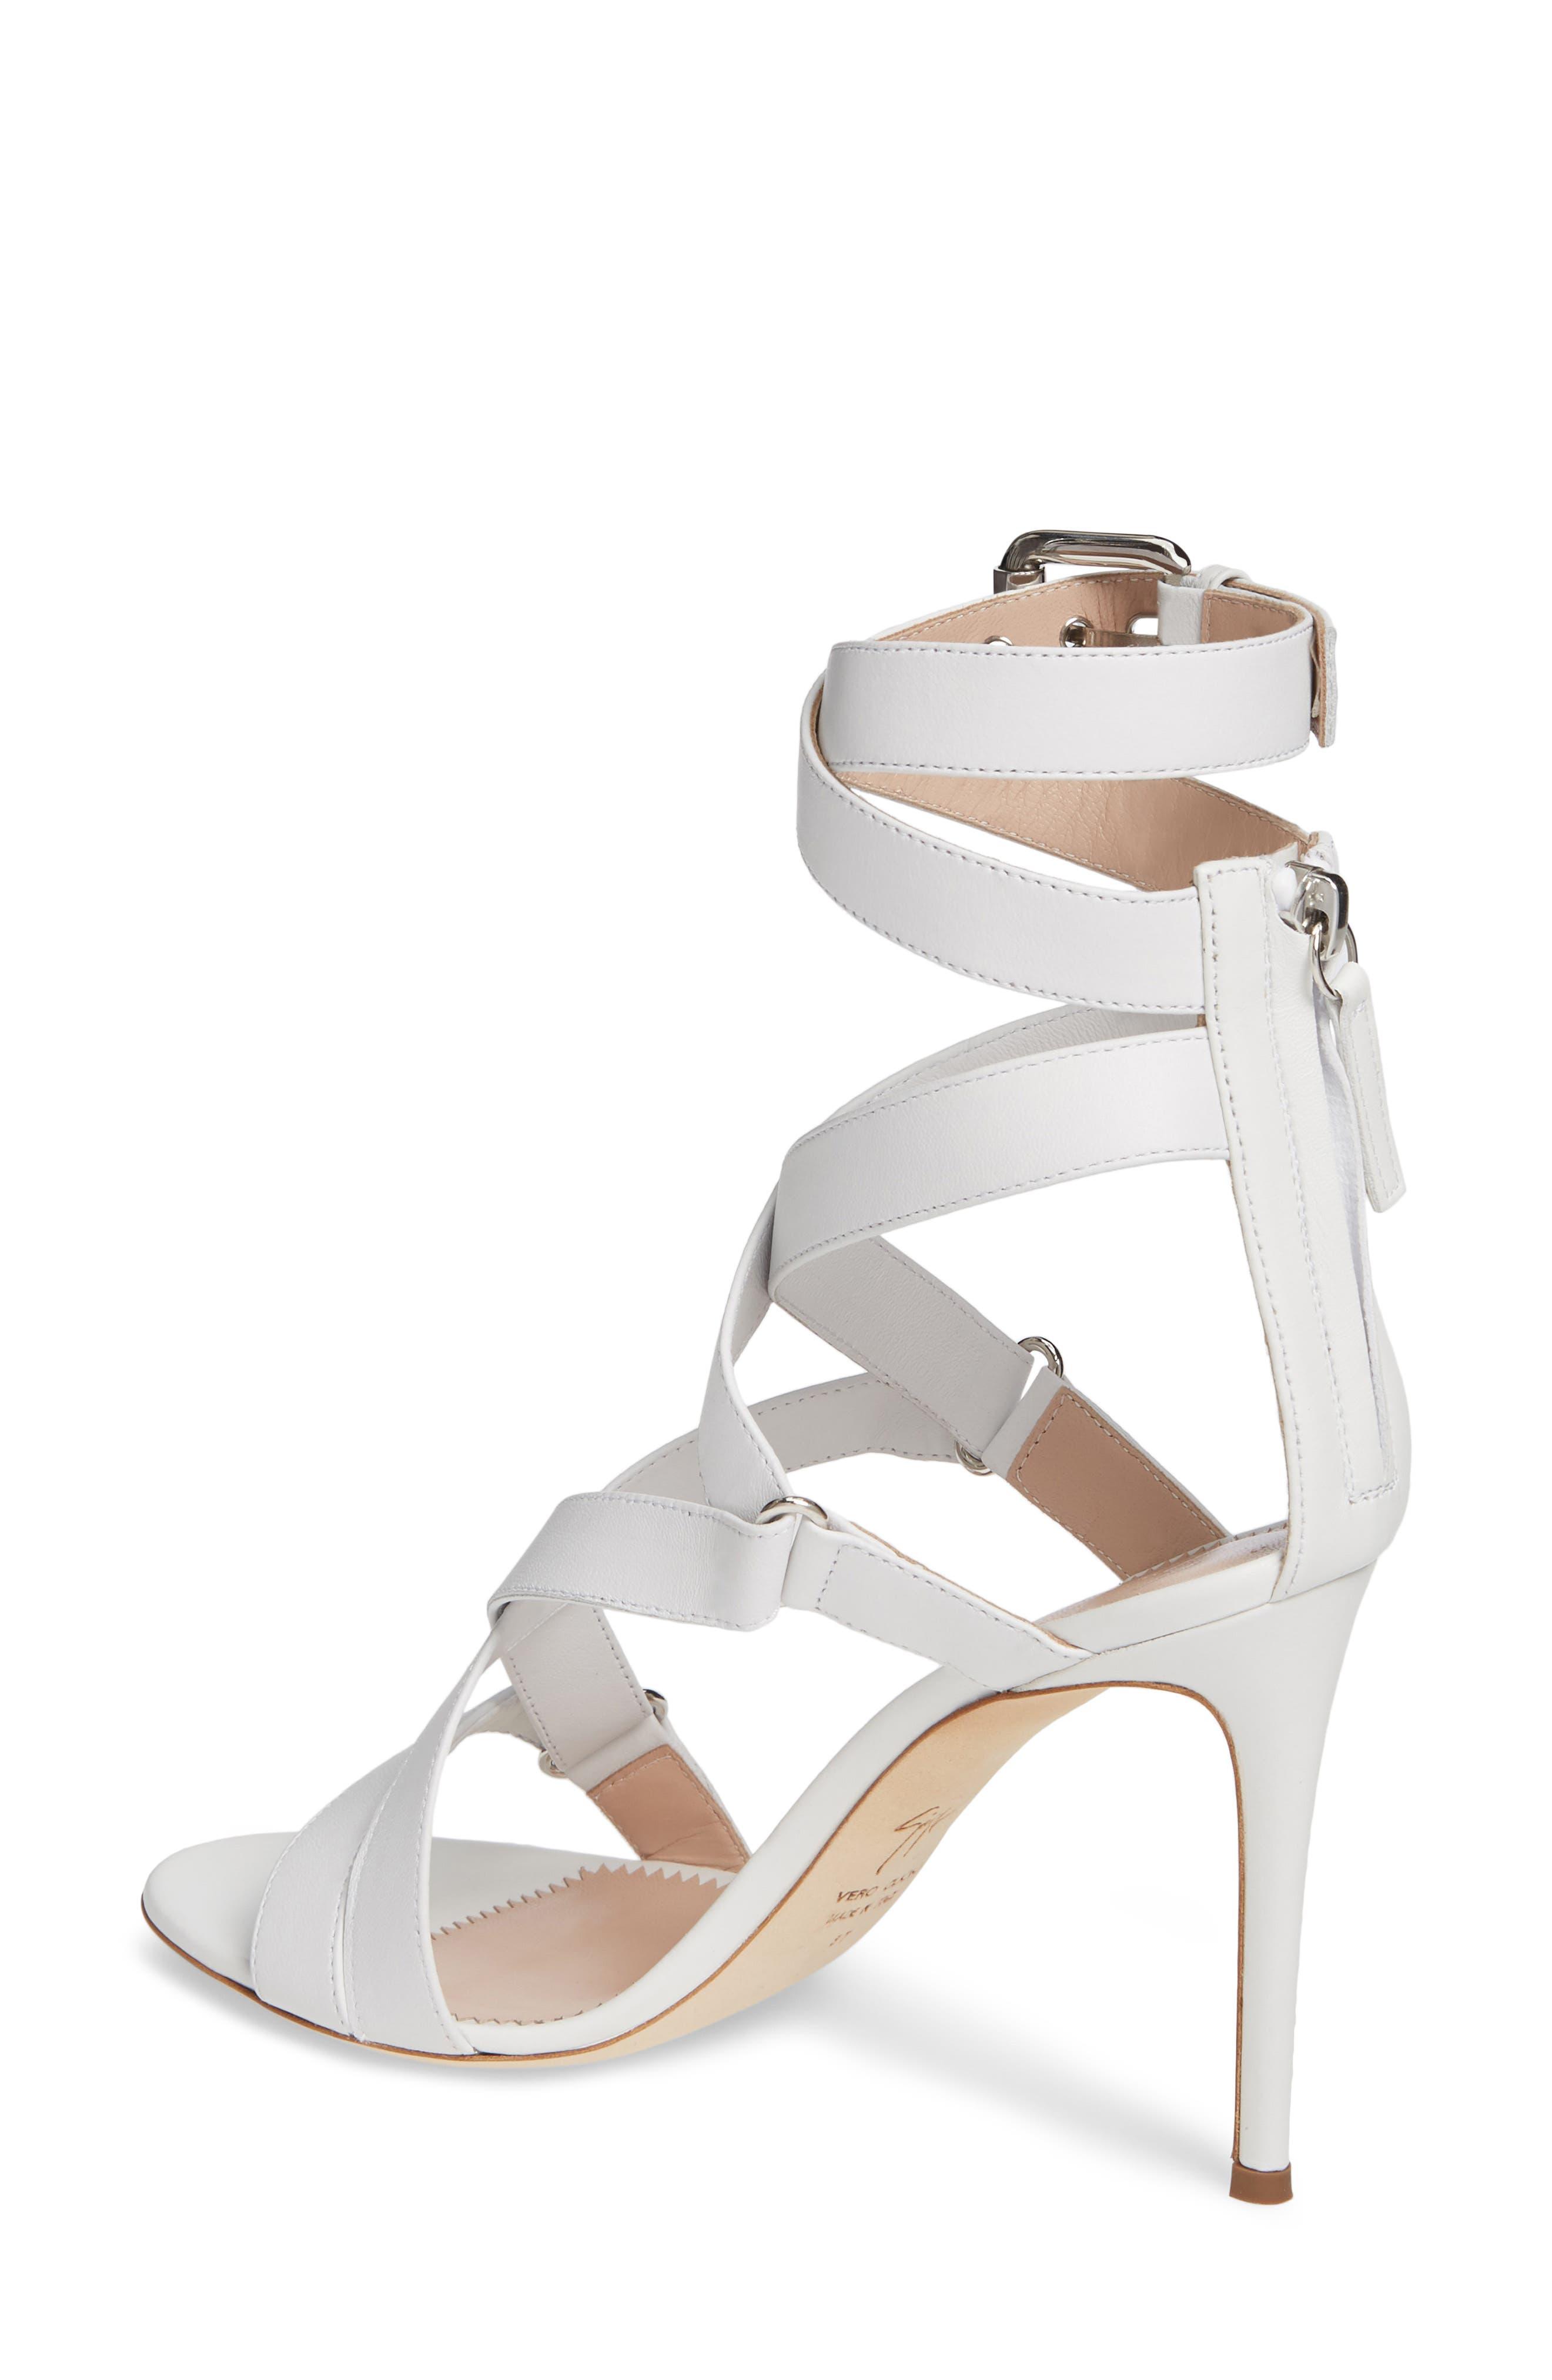 GIUSEPPE ZANOTTI,                             Wrap Sandal,                             Alternate thumbnail 2, color,                             WHITE